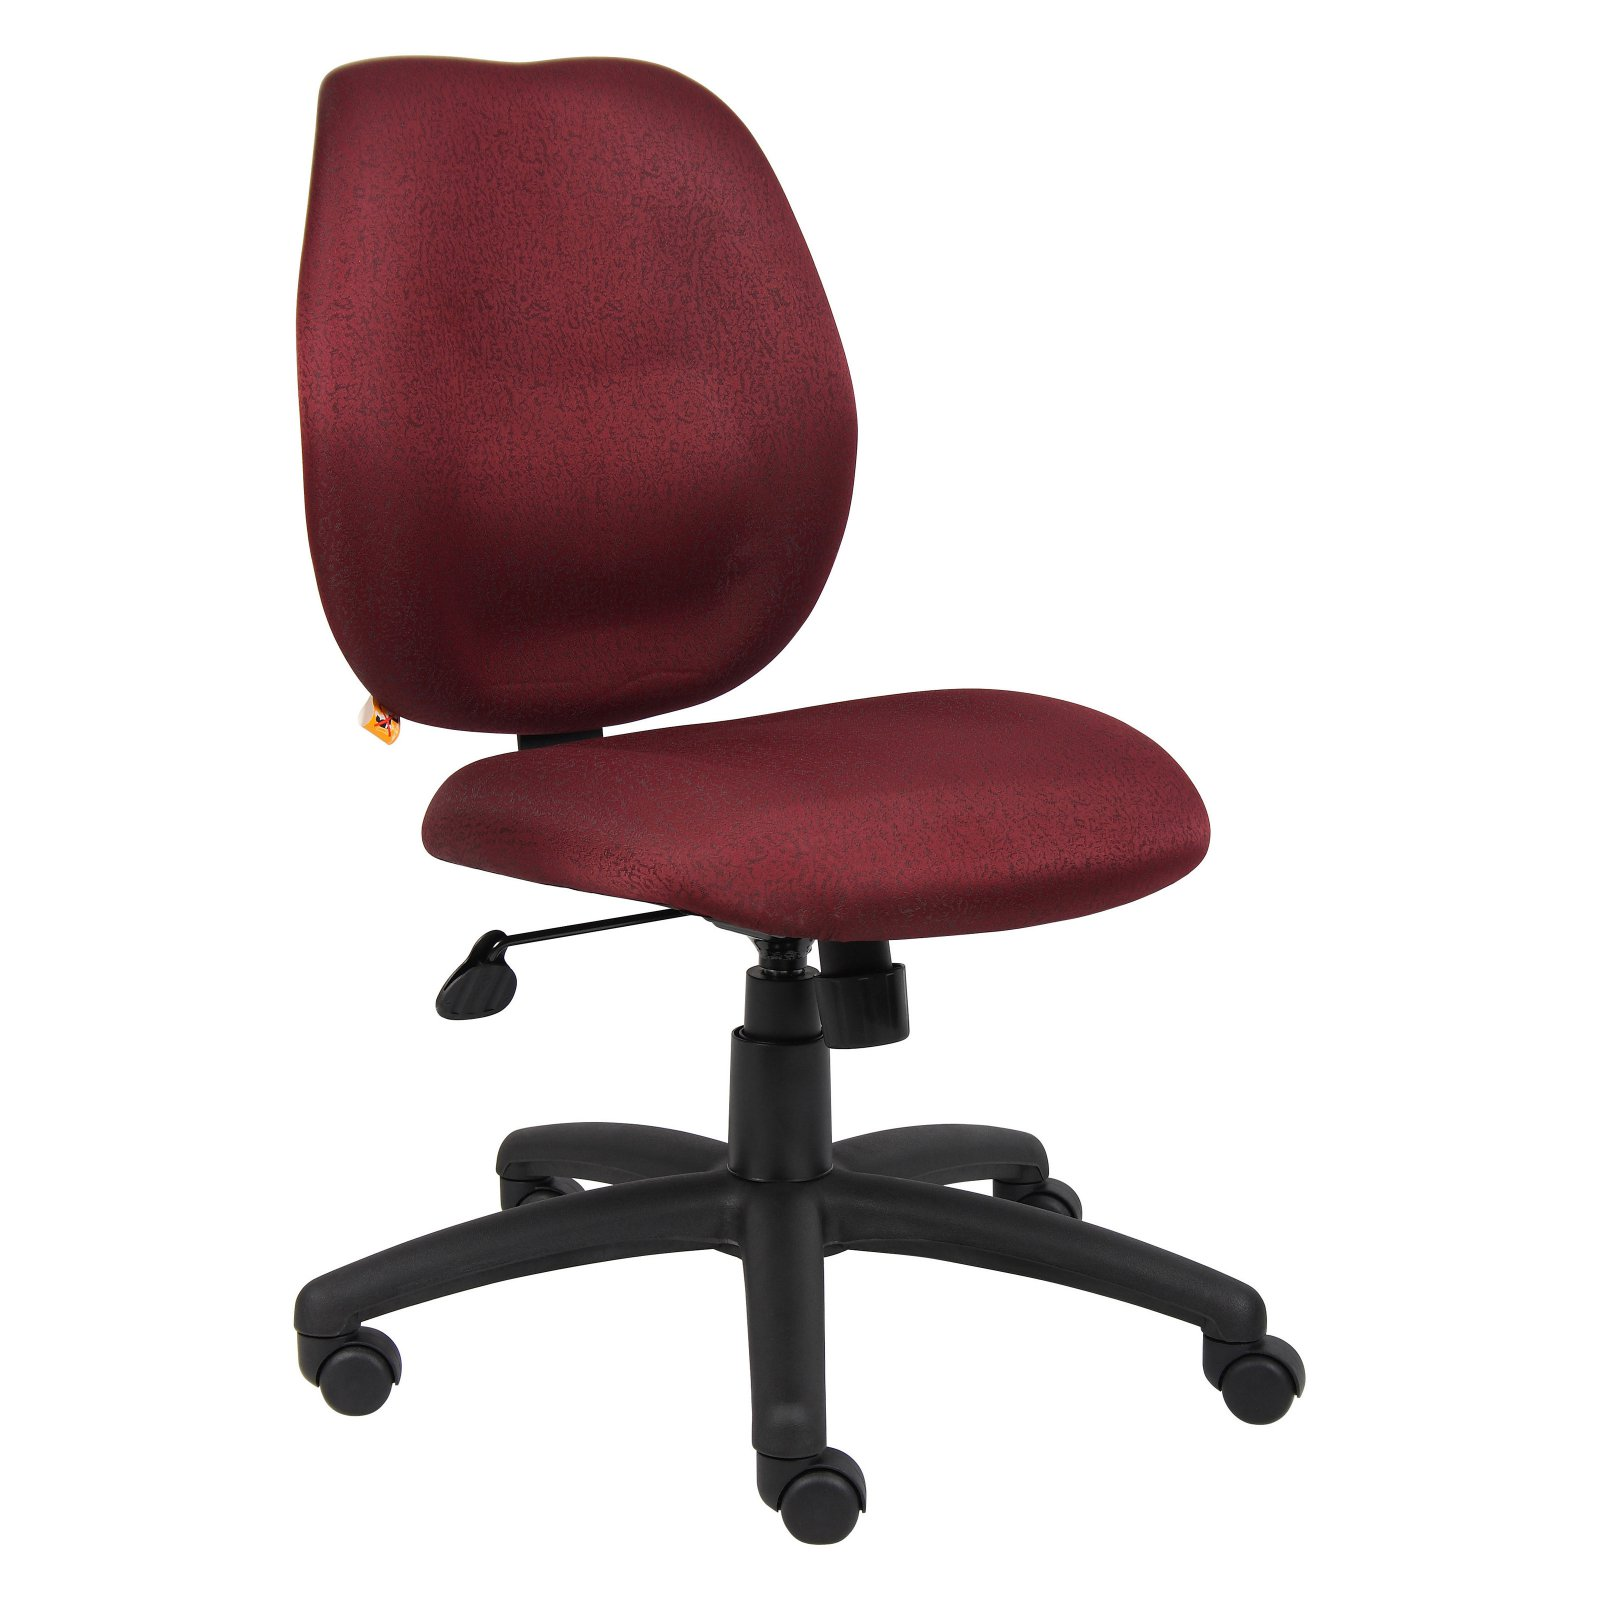 Boss Office & Home Black Mid-back Adjustable Task Chair